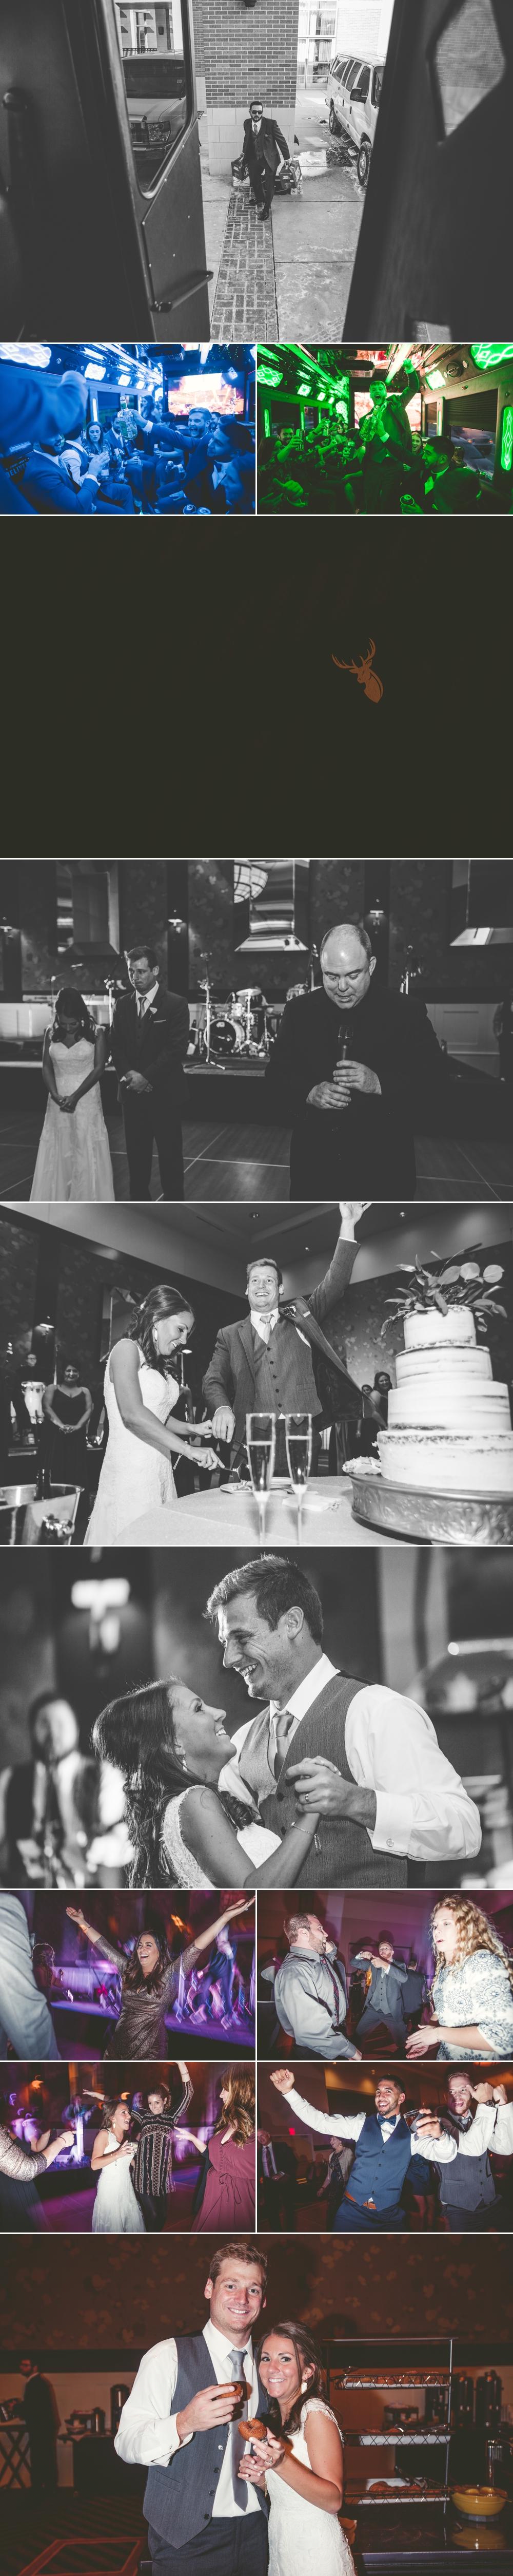 jason_domingues_photography_best_kansas_city_photographer_kc_wedding_weddings_winter0003